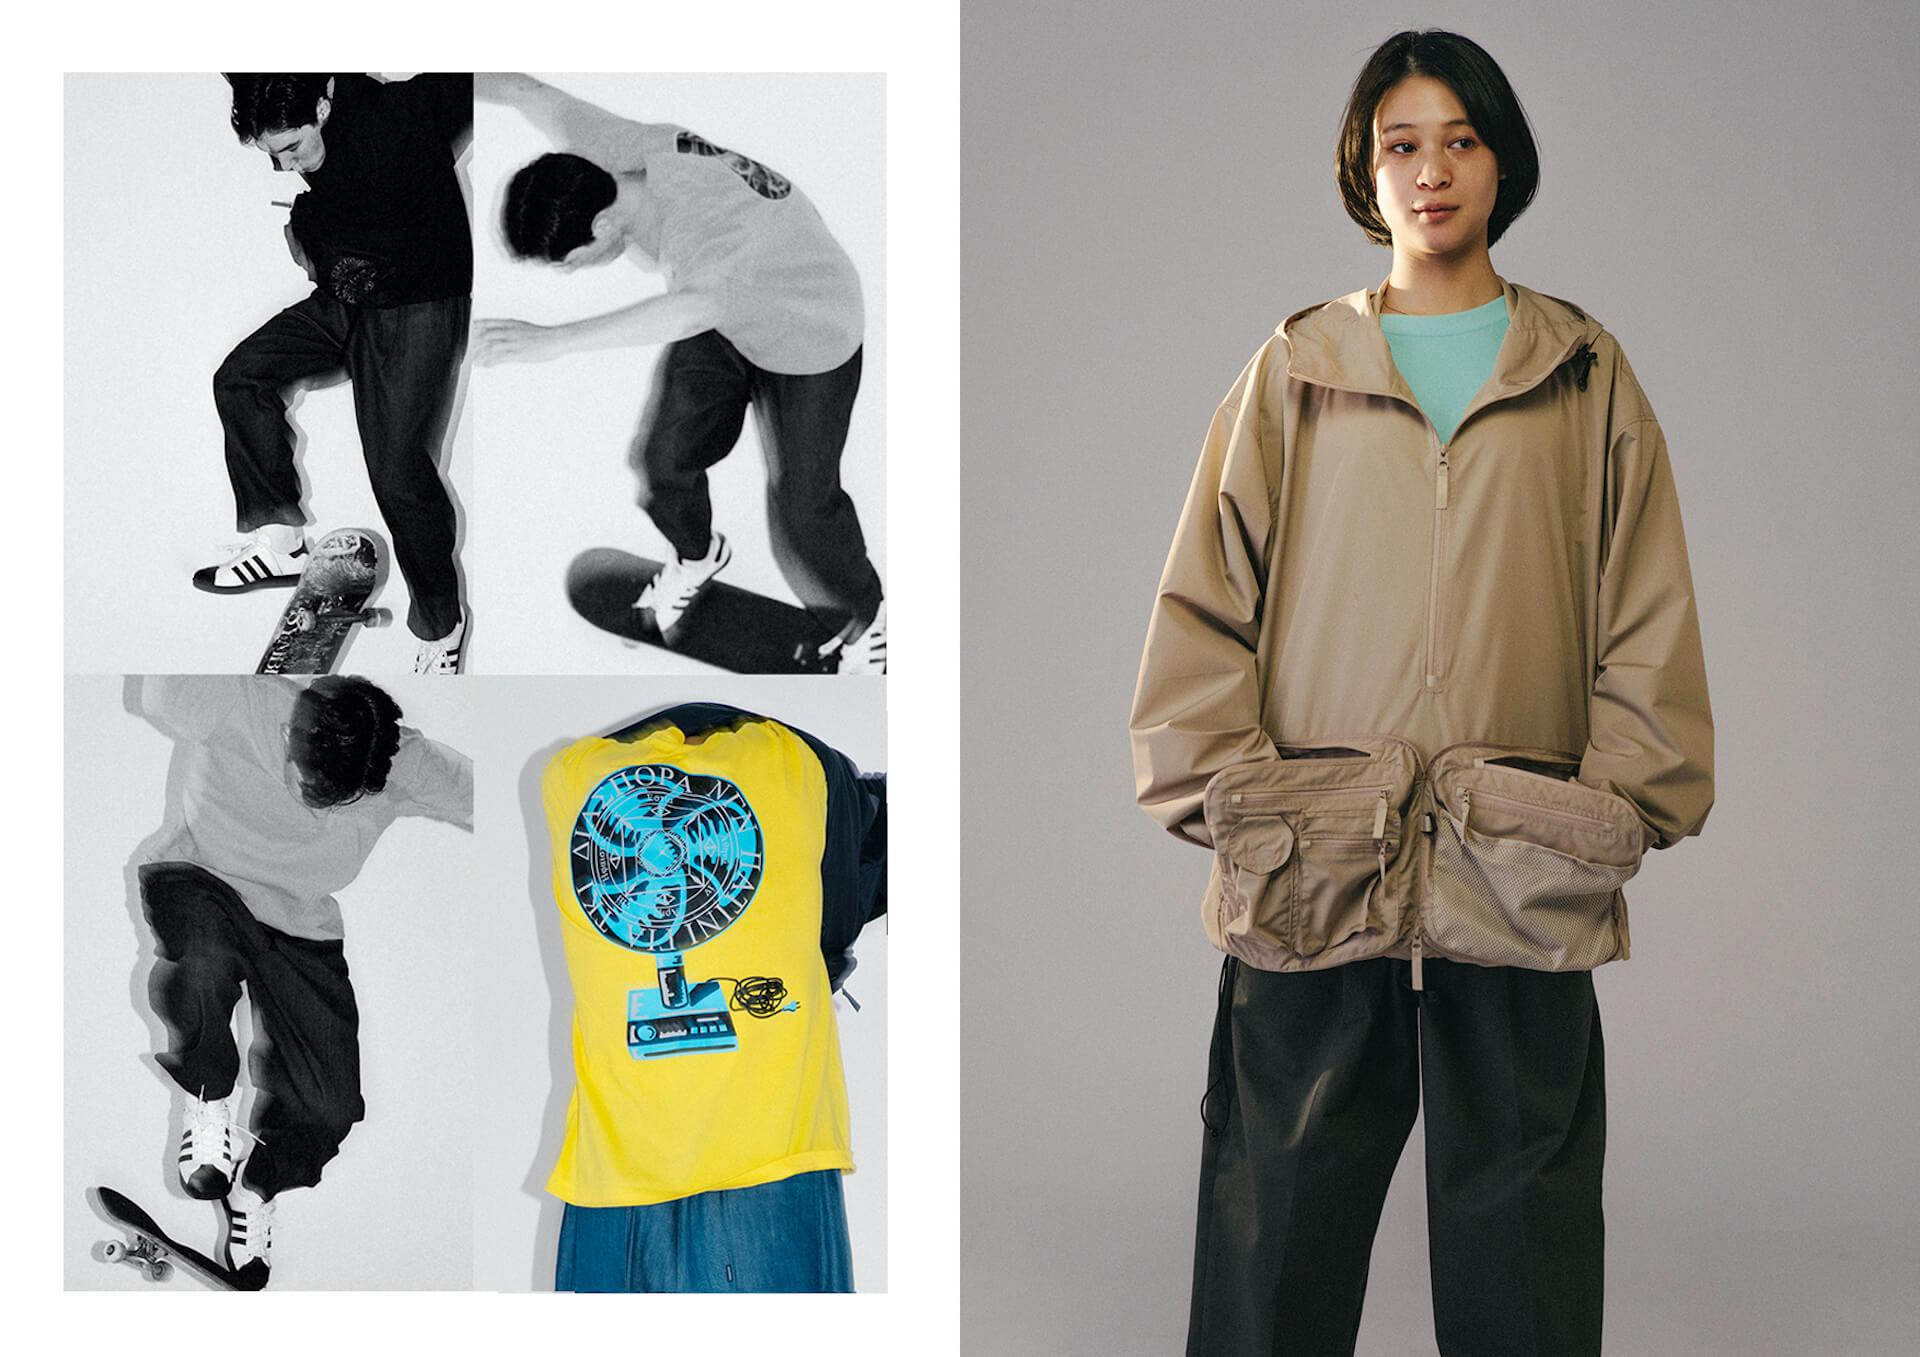 Diaspora skateboardsが2021SSのルックビジュアルを公開!モデルにはmiuらを起用 fashion210225_diasporaskateboards-06